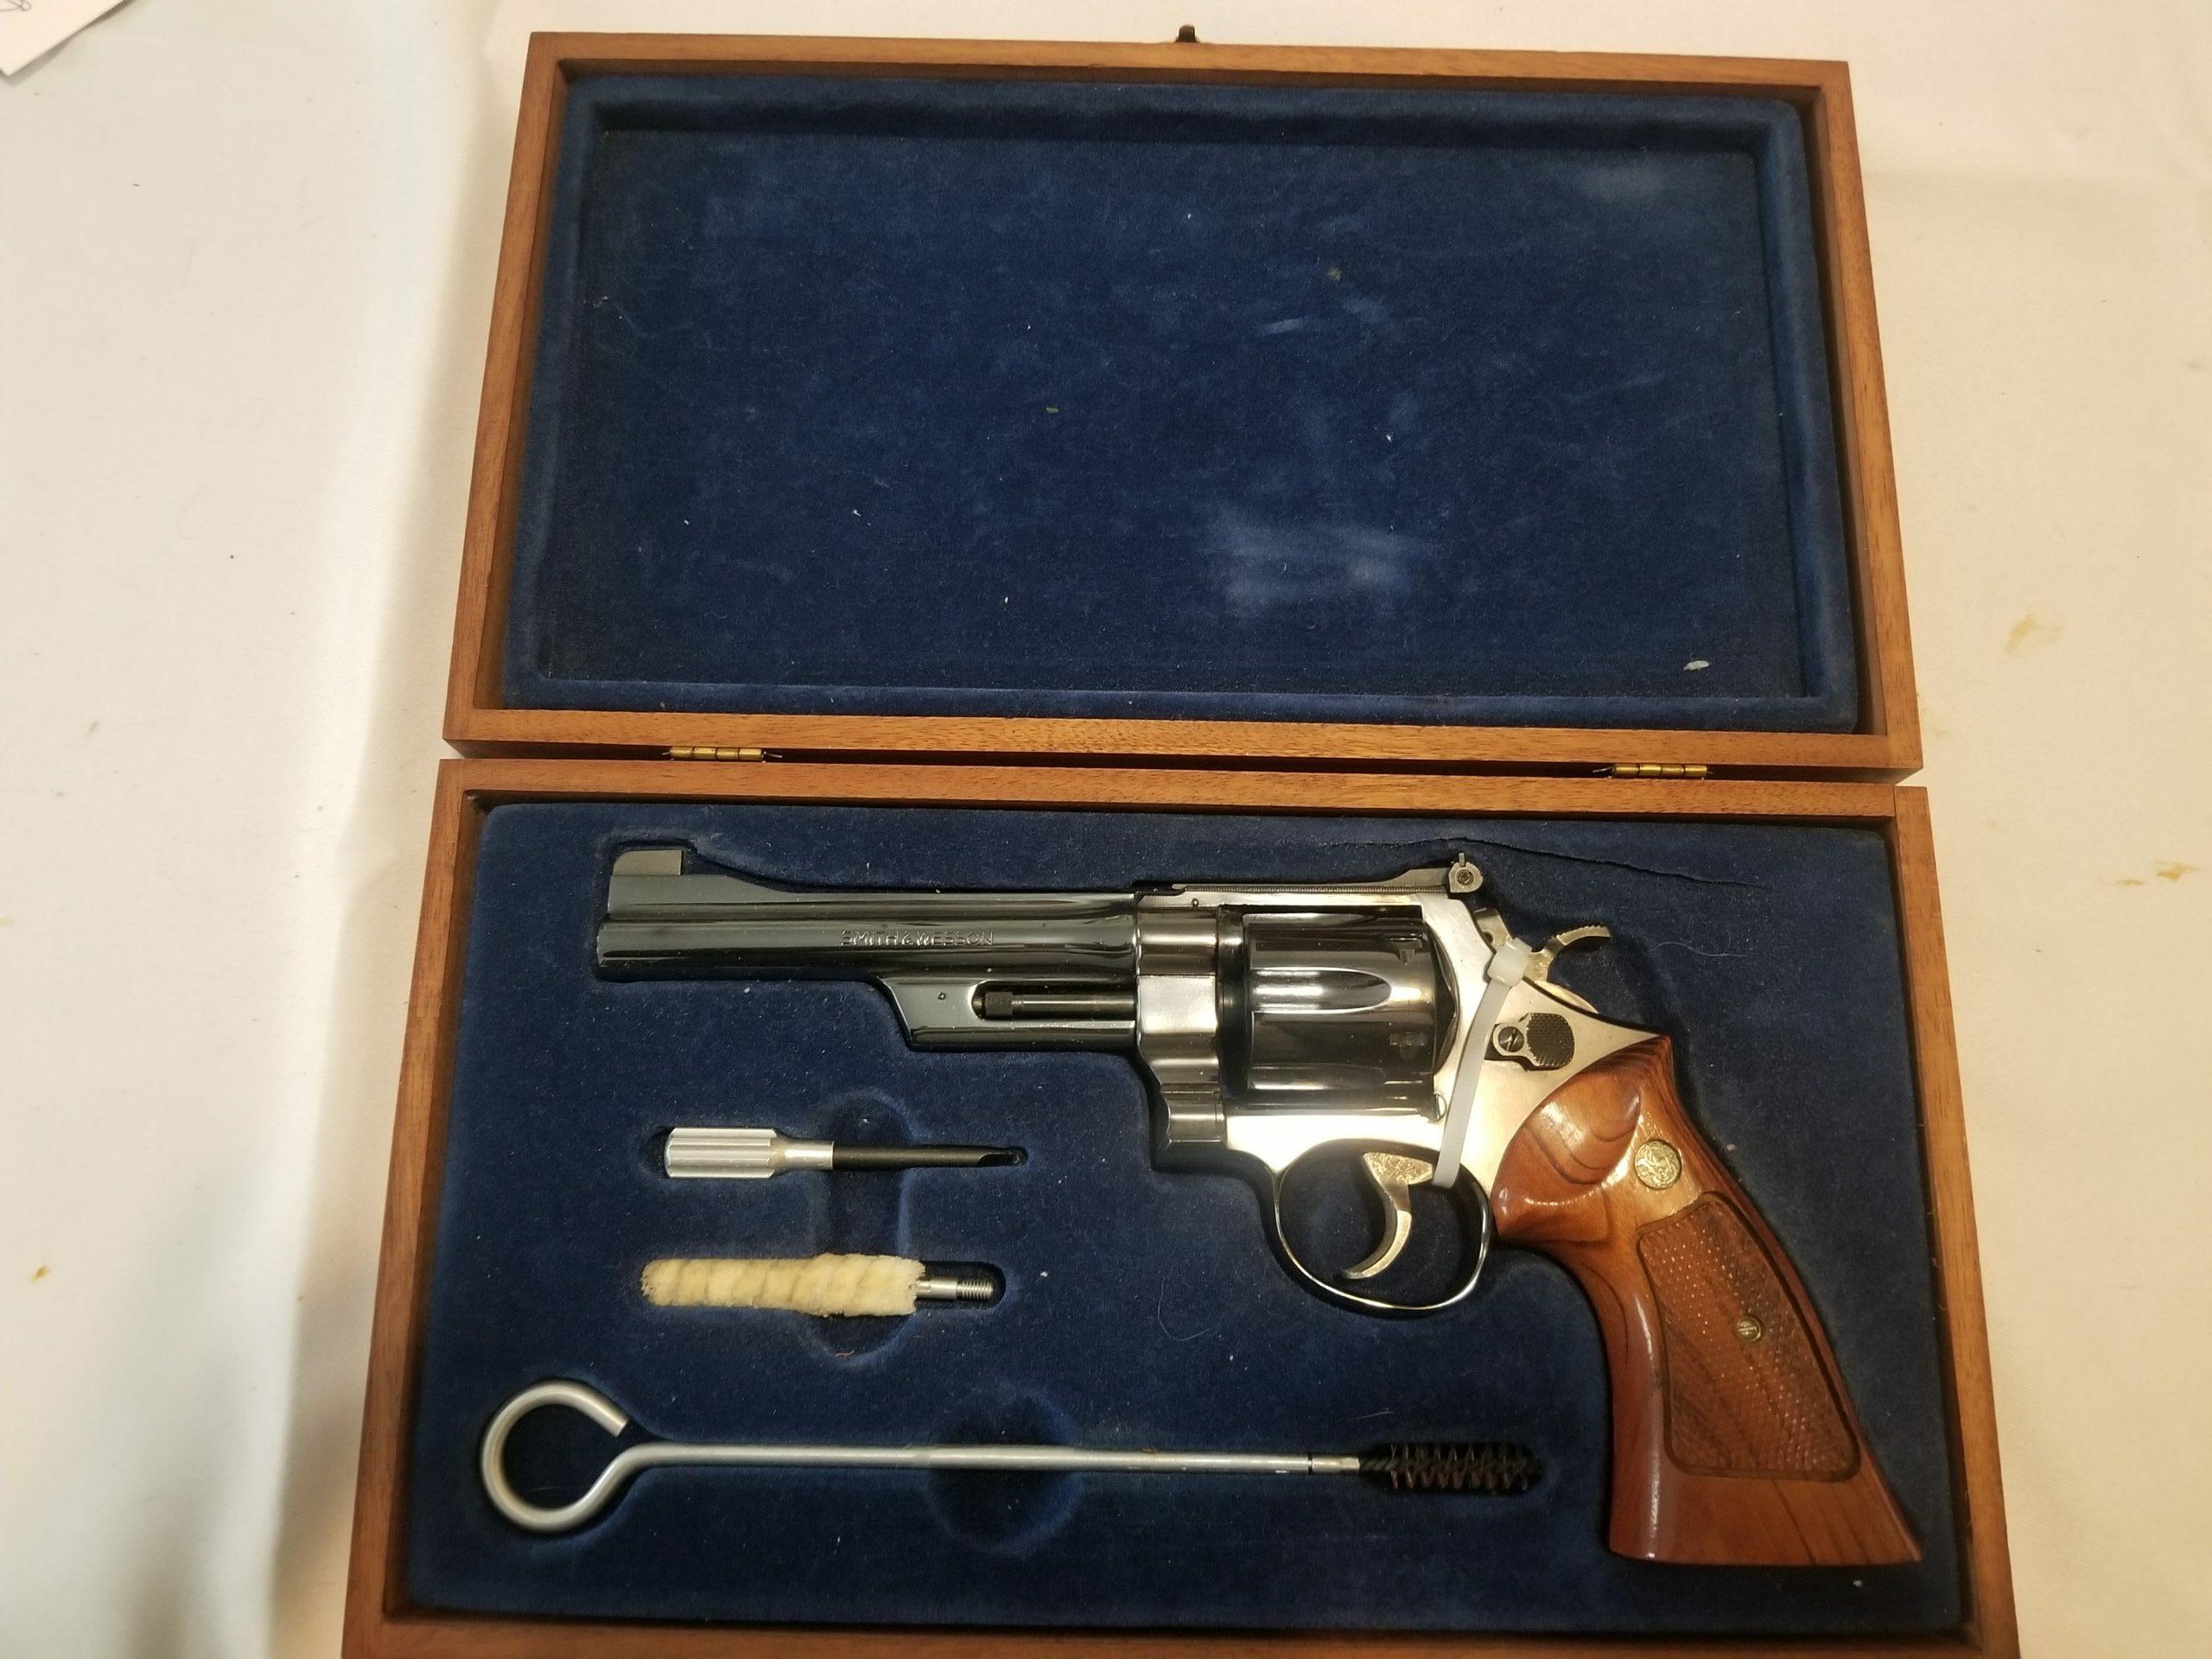 Smith & Wesson Model 27-2 .357 Magnum Revolver